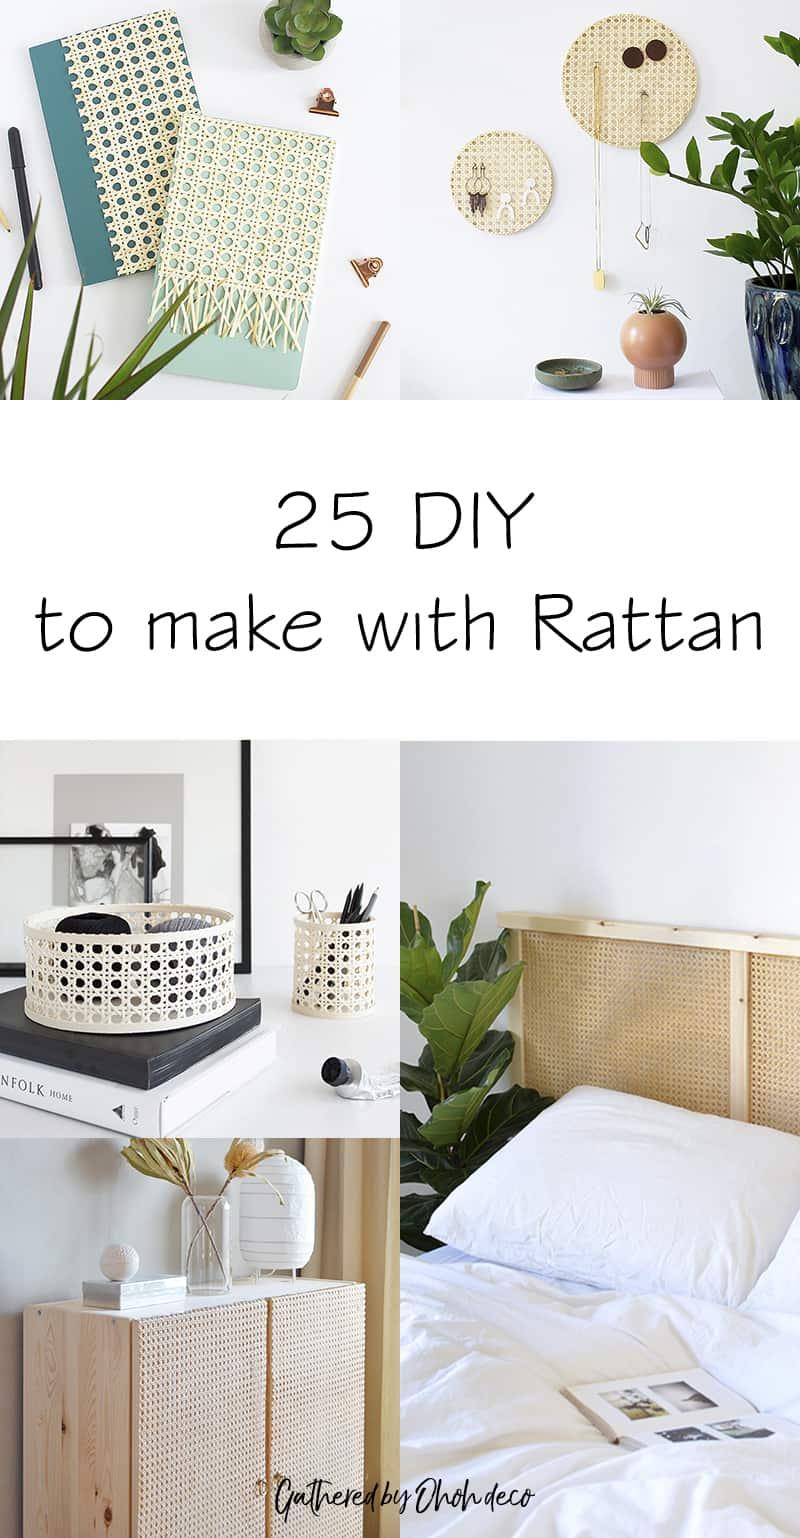 Rattan DIY ideas